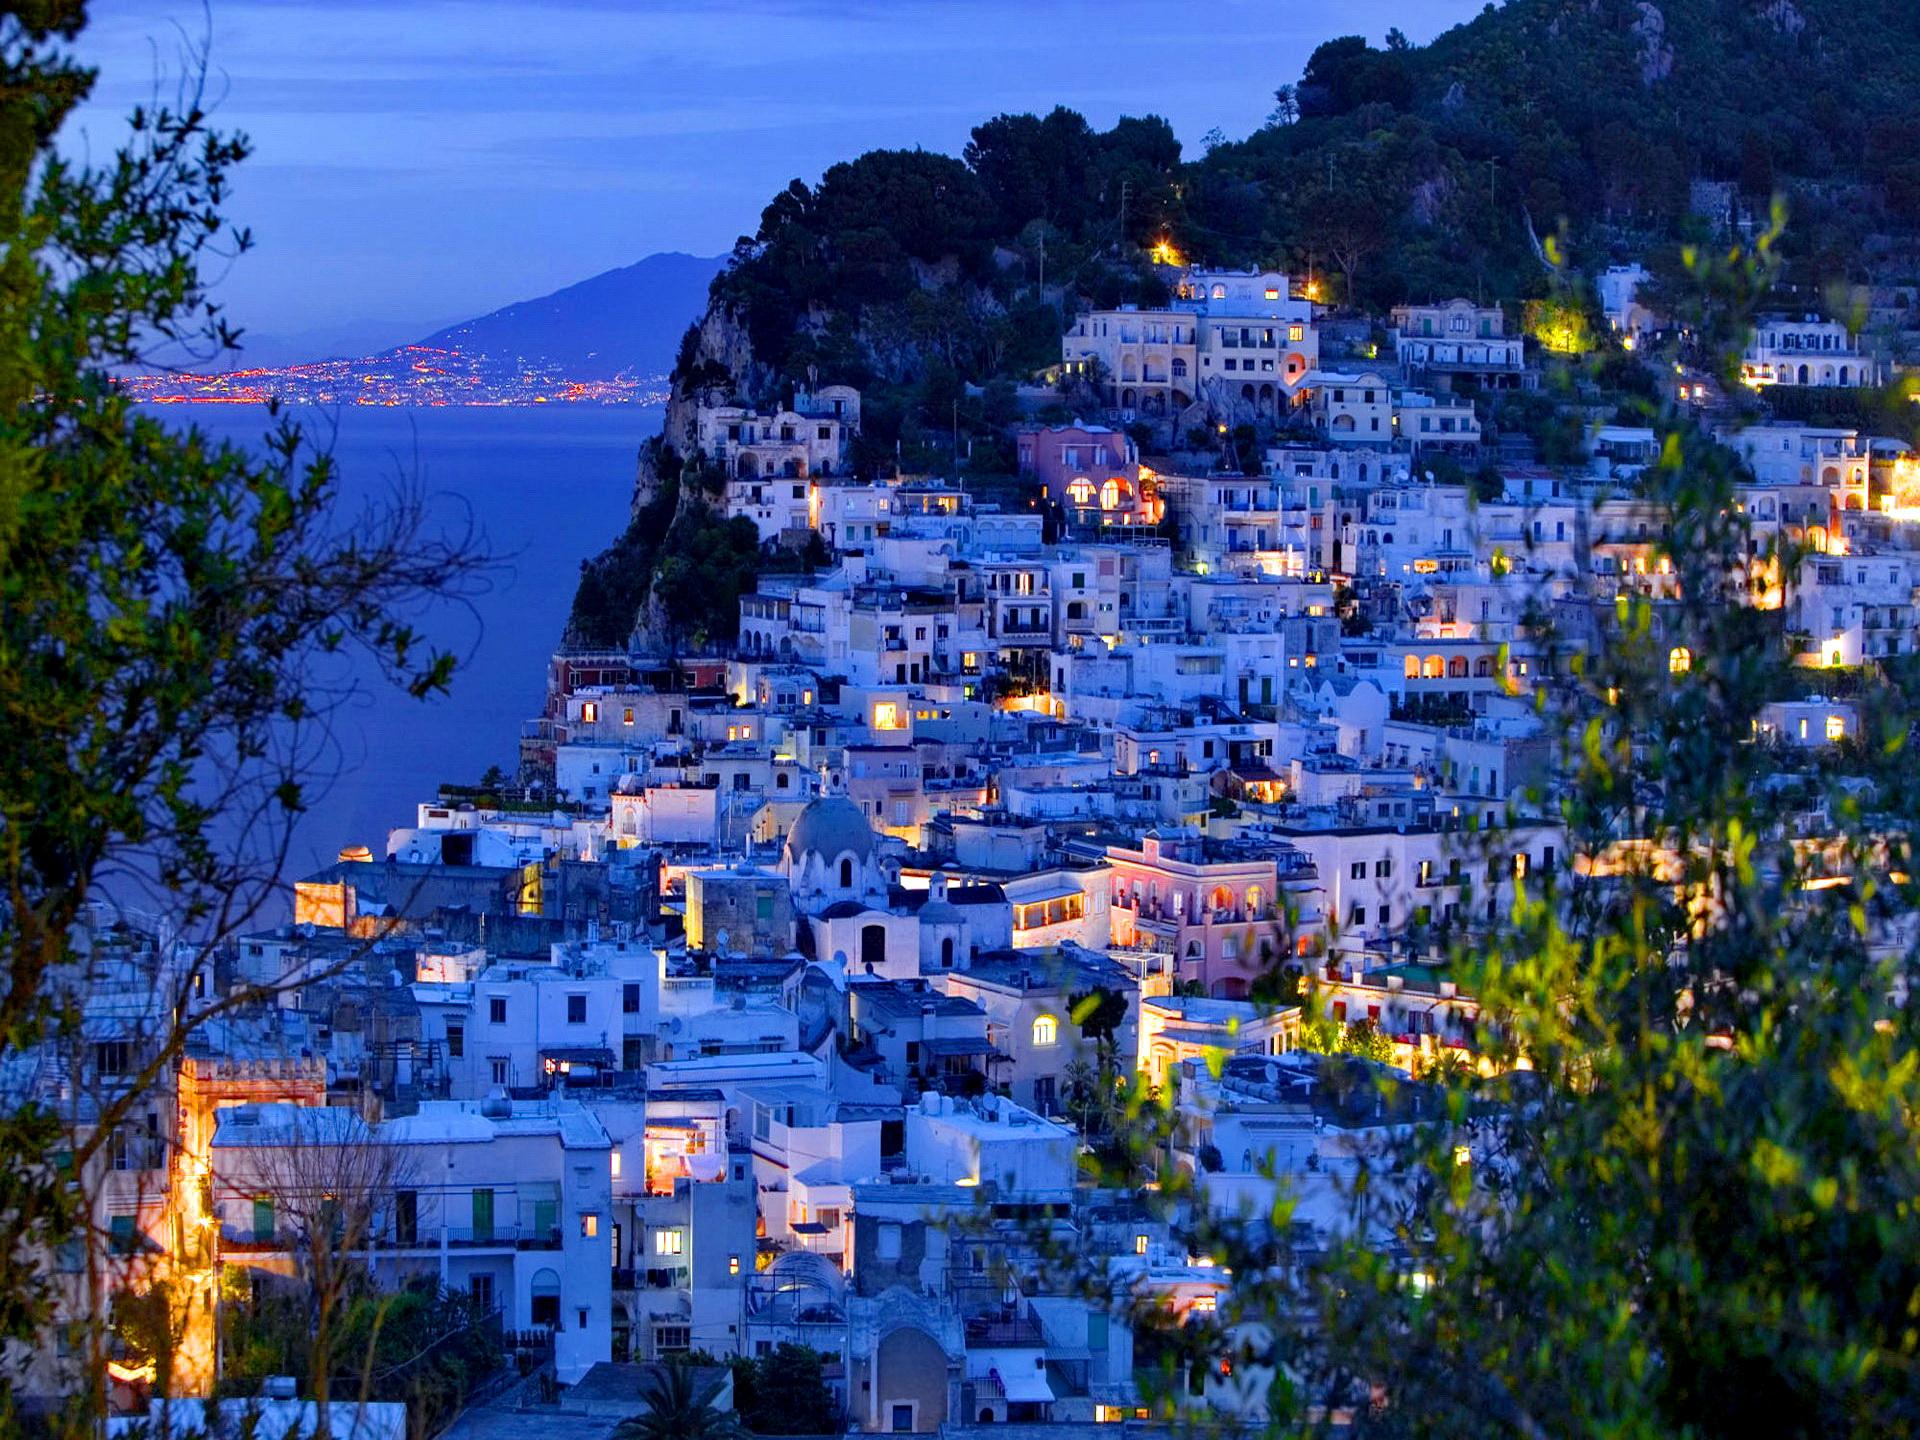 Evening View of Capri Town from via Castello. Capri. Bay of Naples. Campania. Italy.